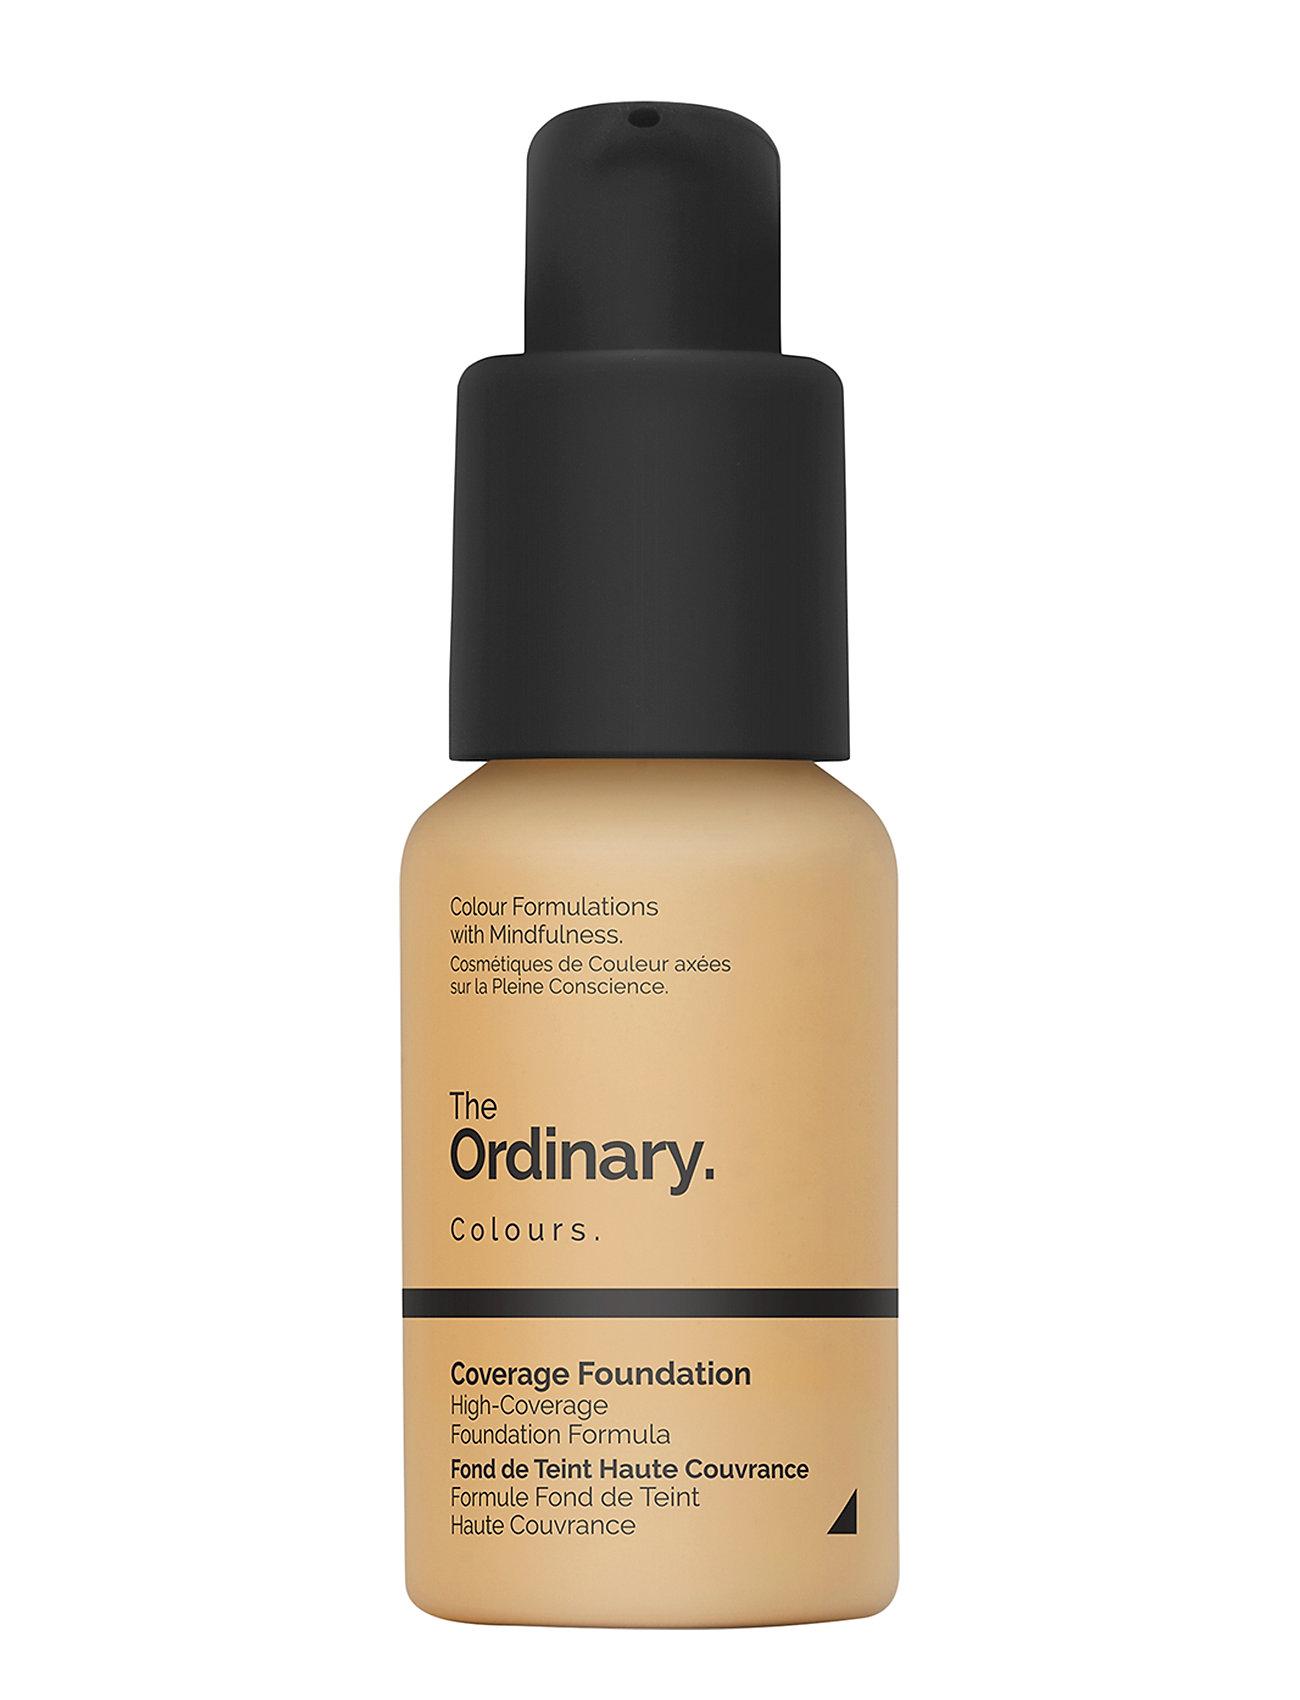 Image of Coverage Foundation 3.0 Y Medium Dark Yellow Foundation Makeup The Ordinary (3285791569)